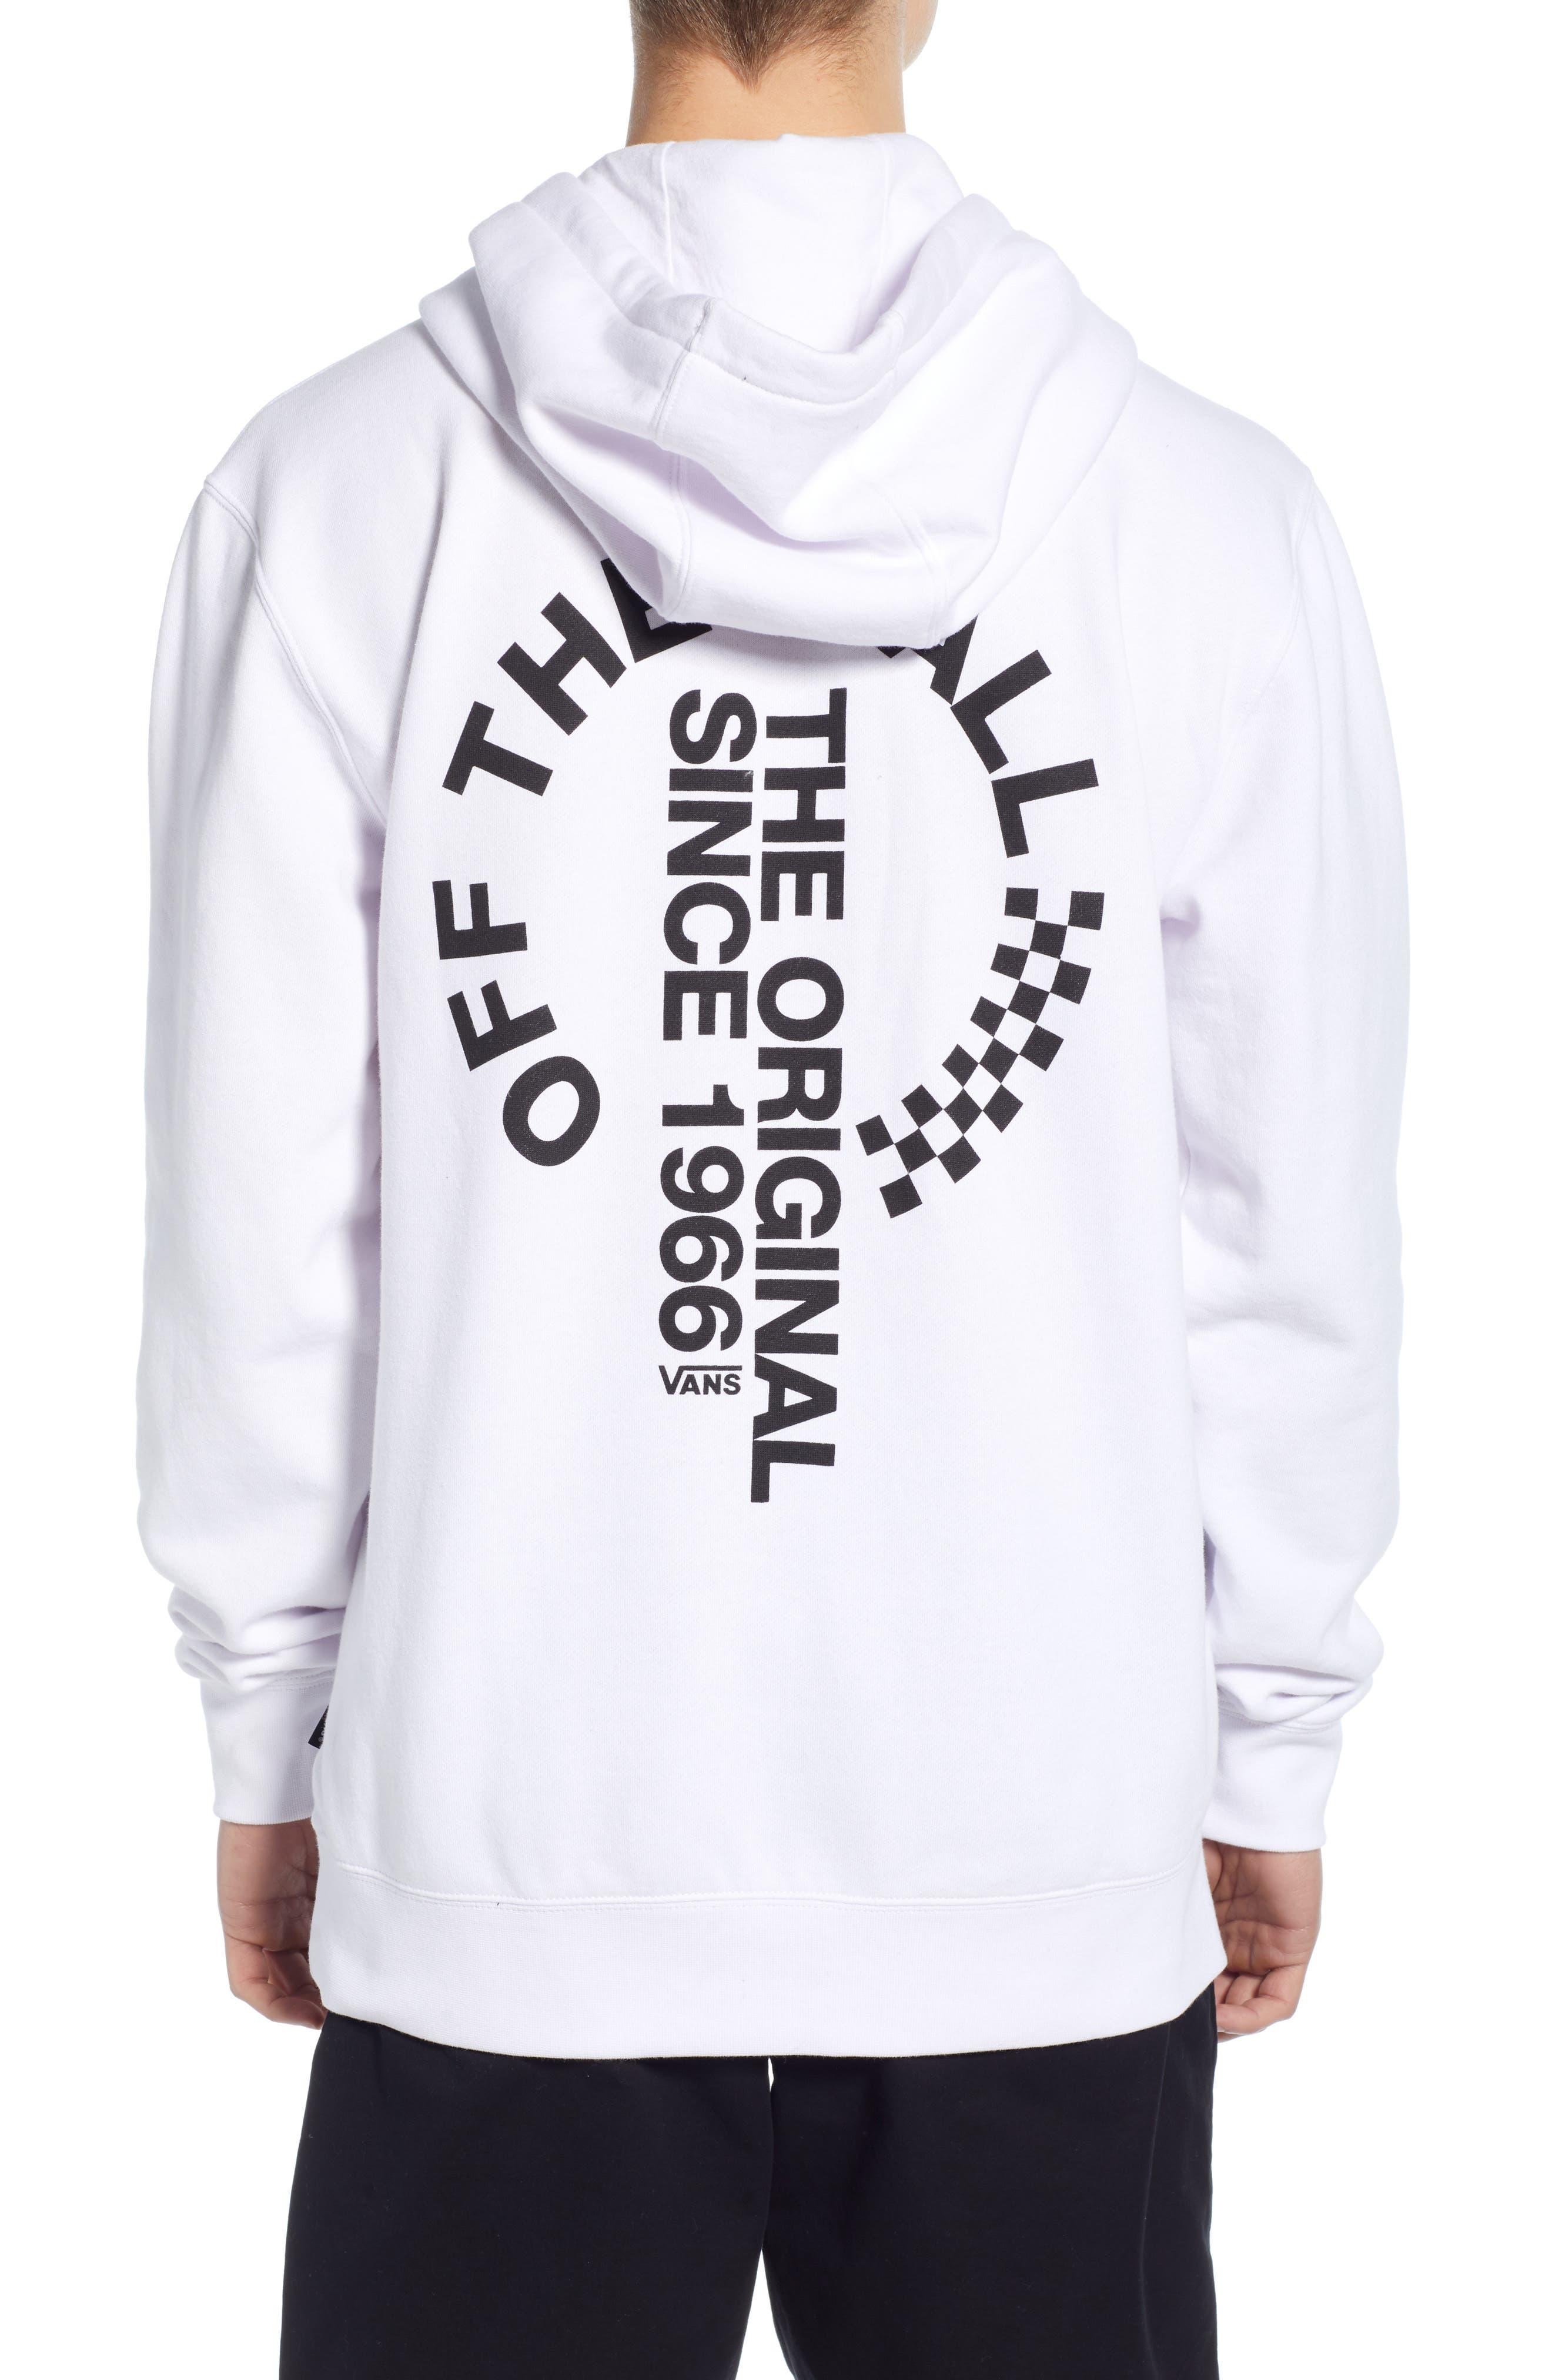 VANS, Off the Wall Distort Hooded Sweatshirt, Alternate thumbnail 2, color, WHITE